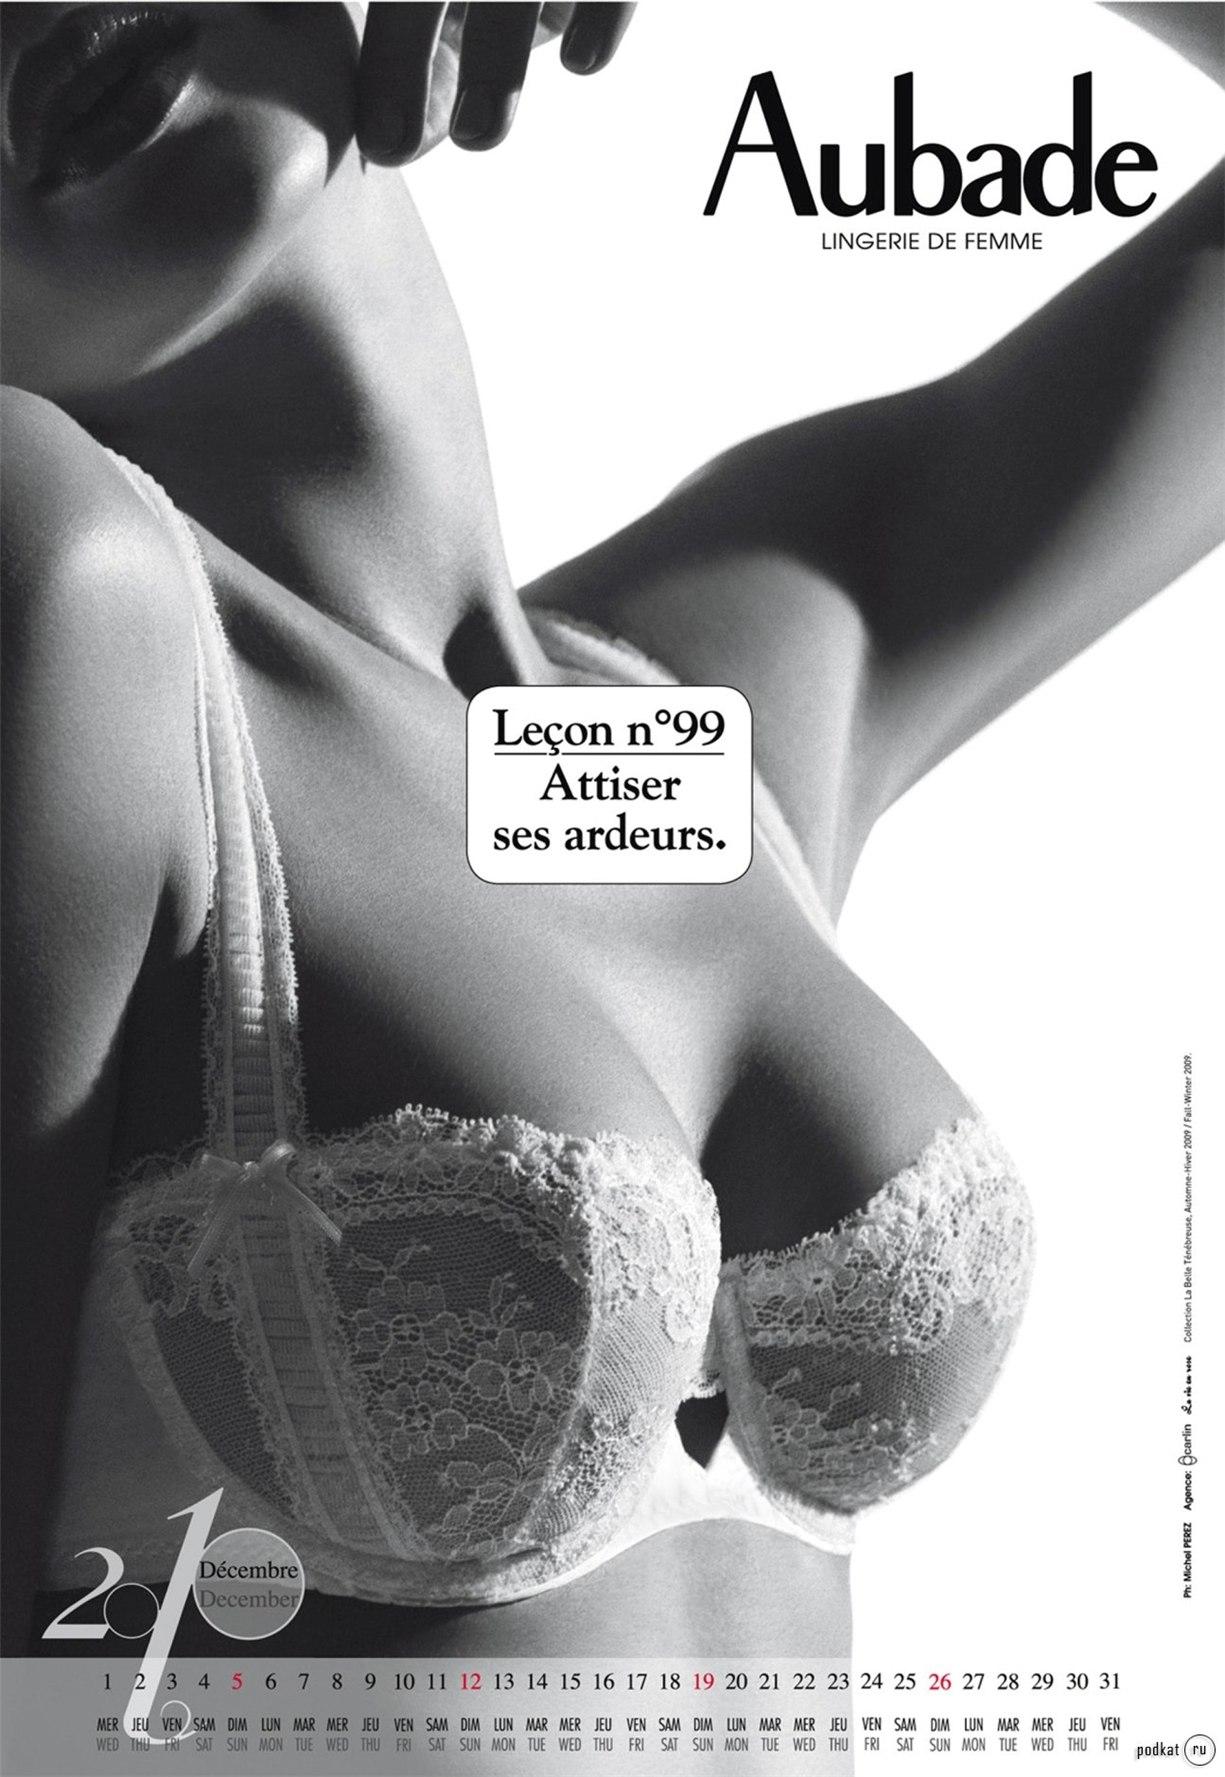 женское белье Aubade - календарь на 2010 год